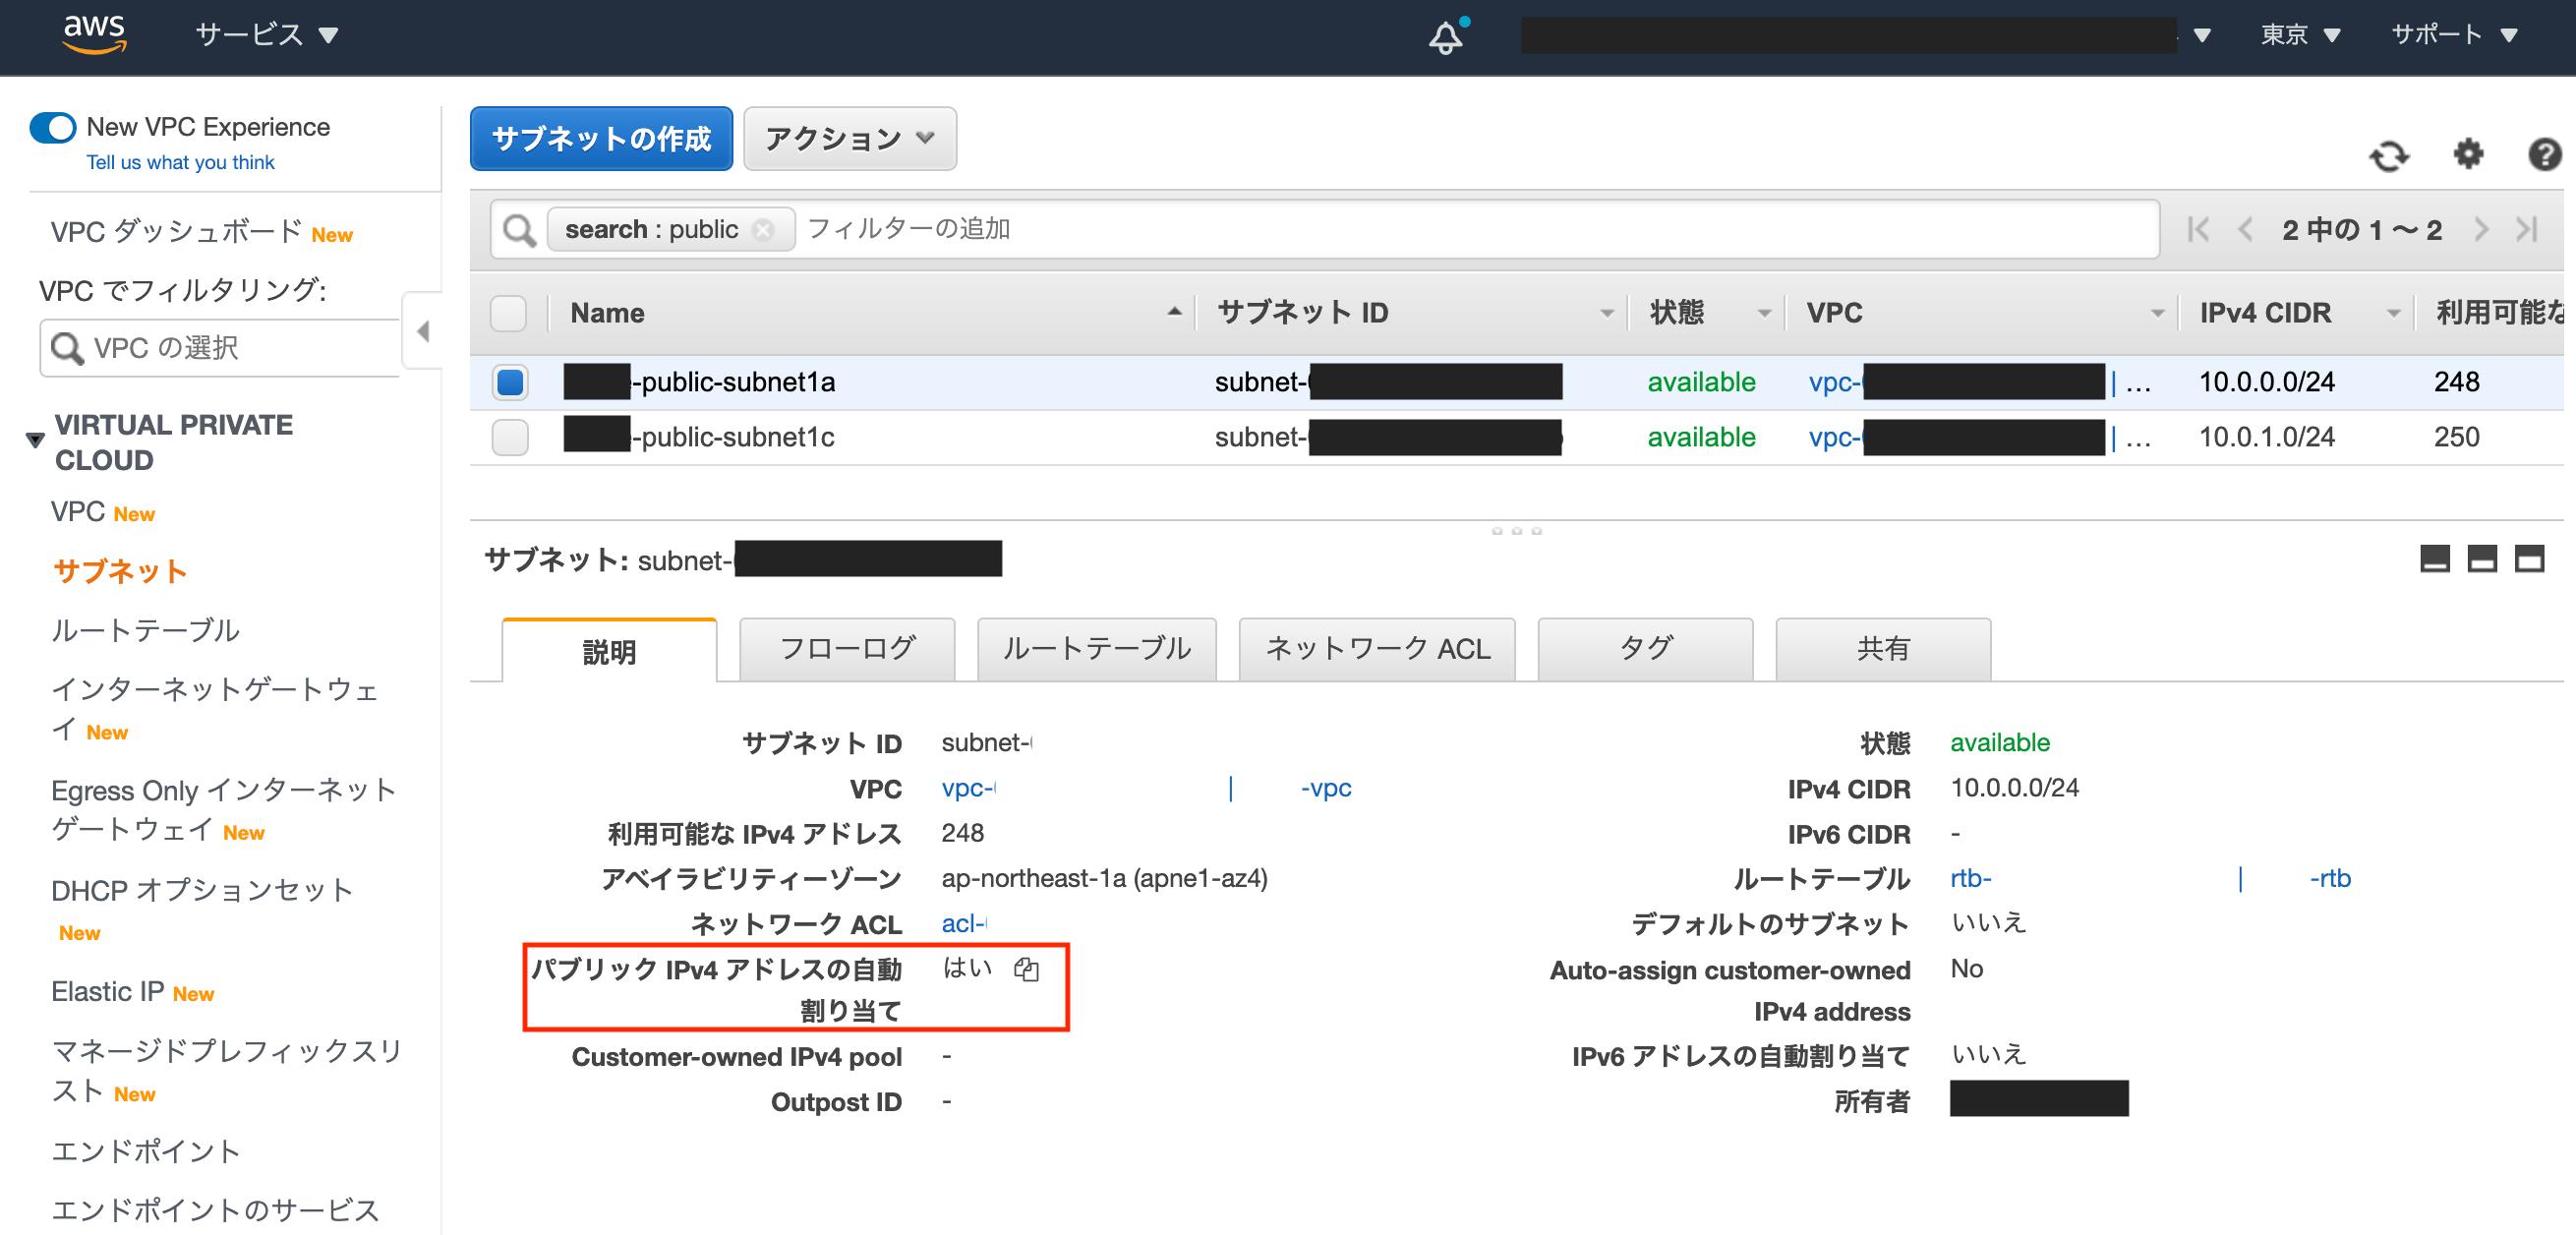 Screenshot 2020-09-23 16.56.00.png